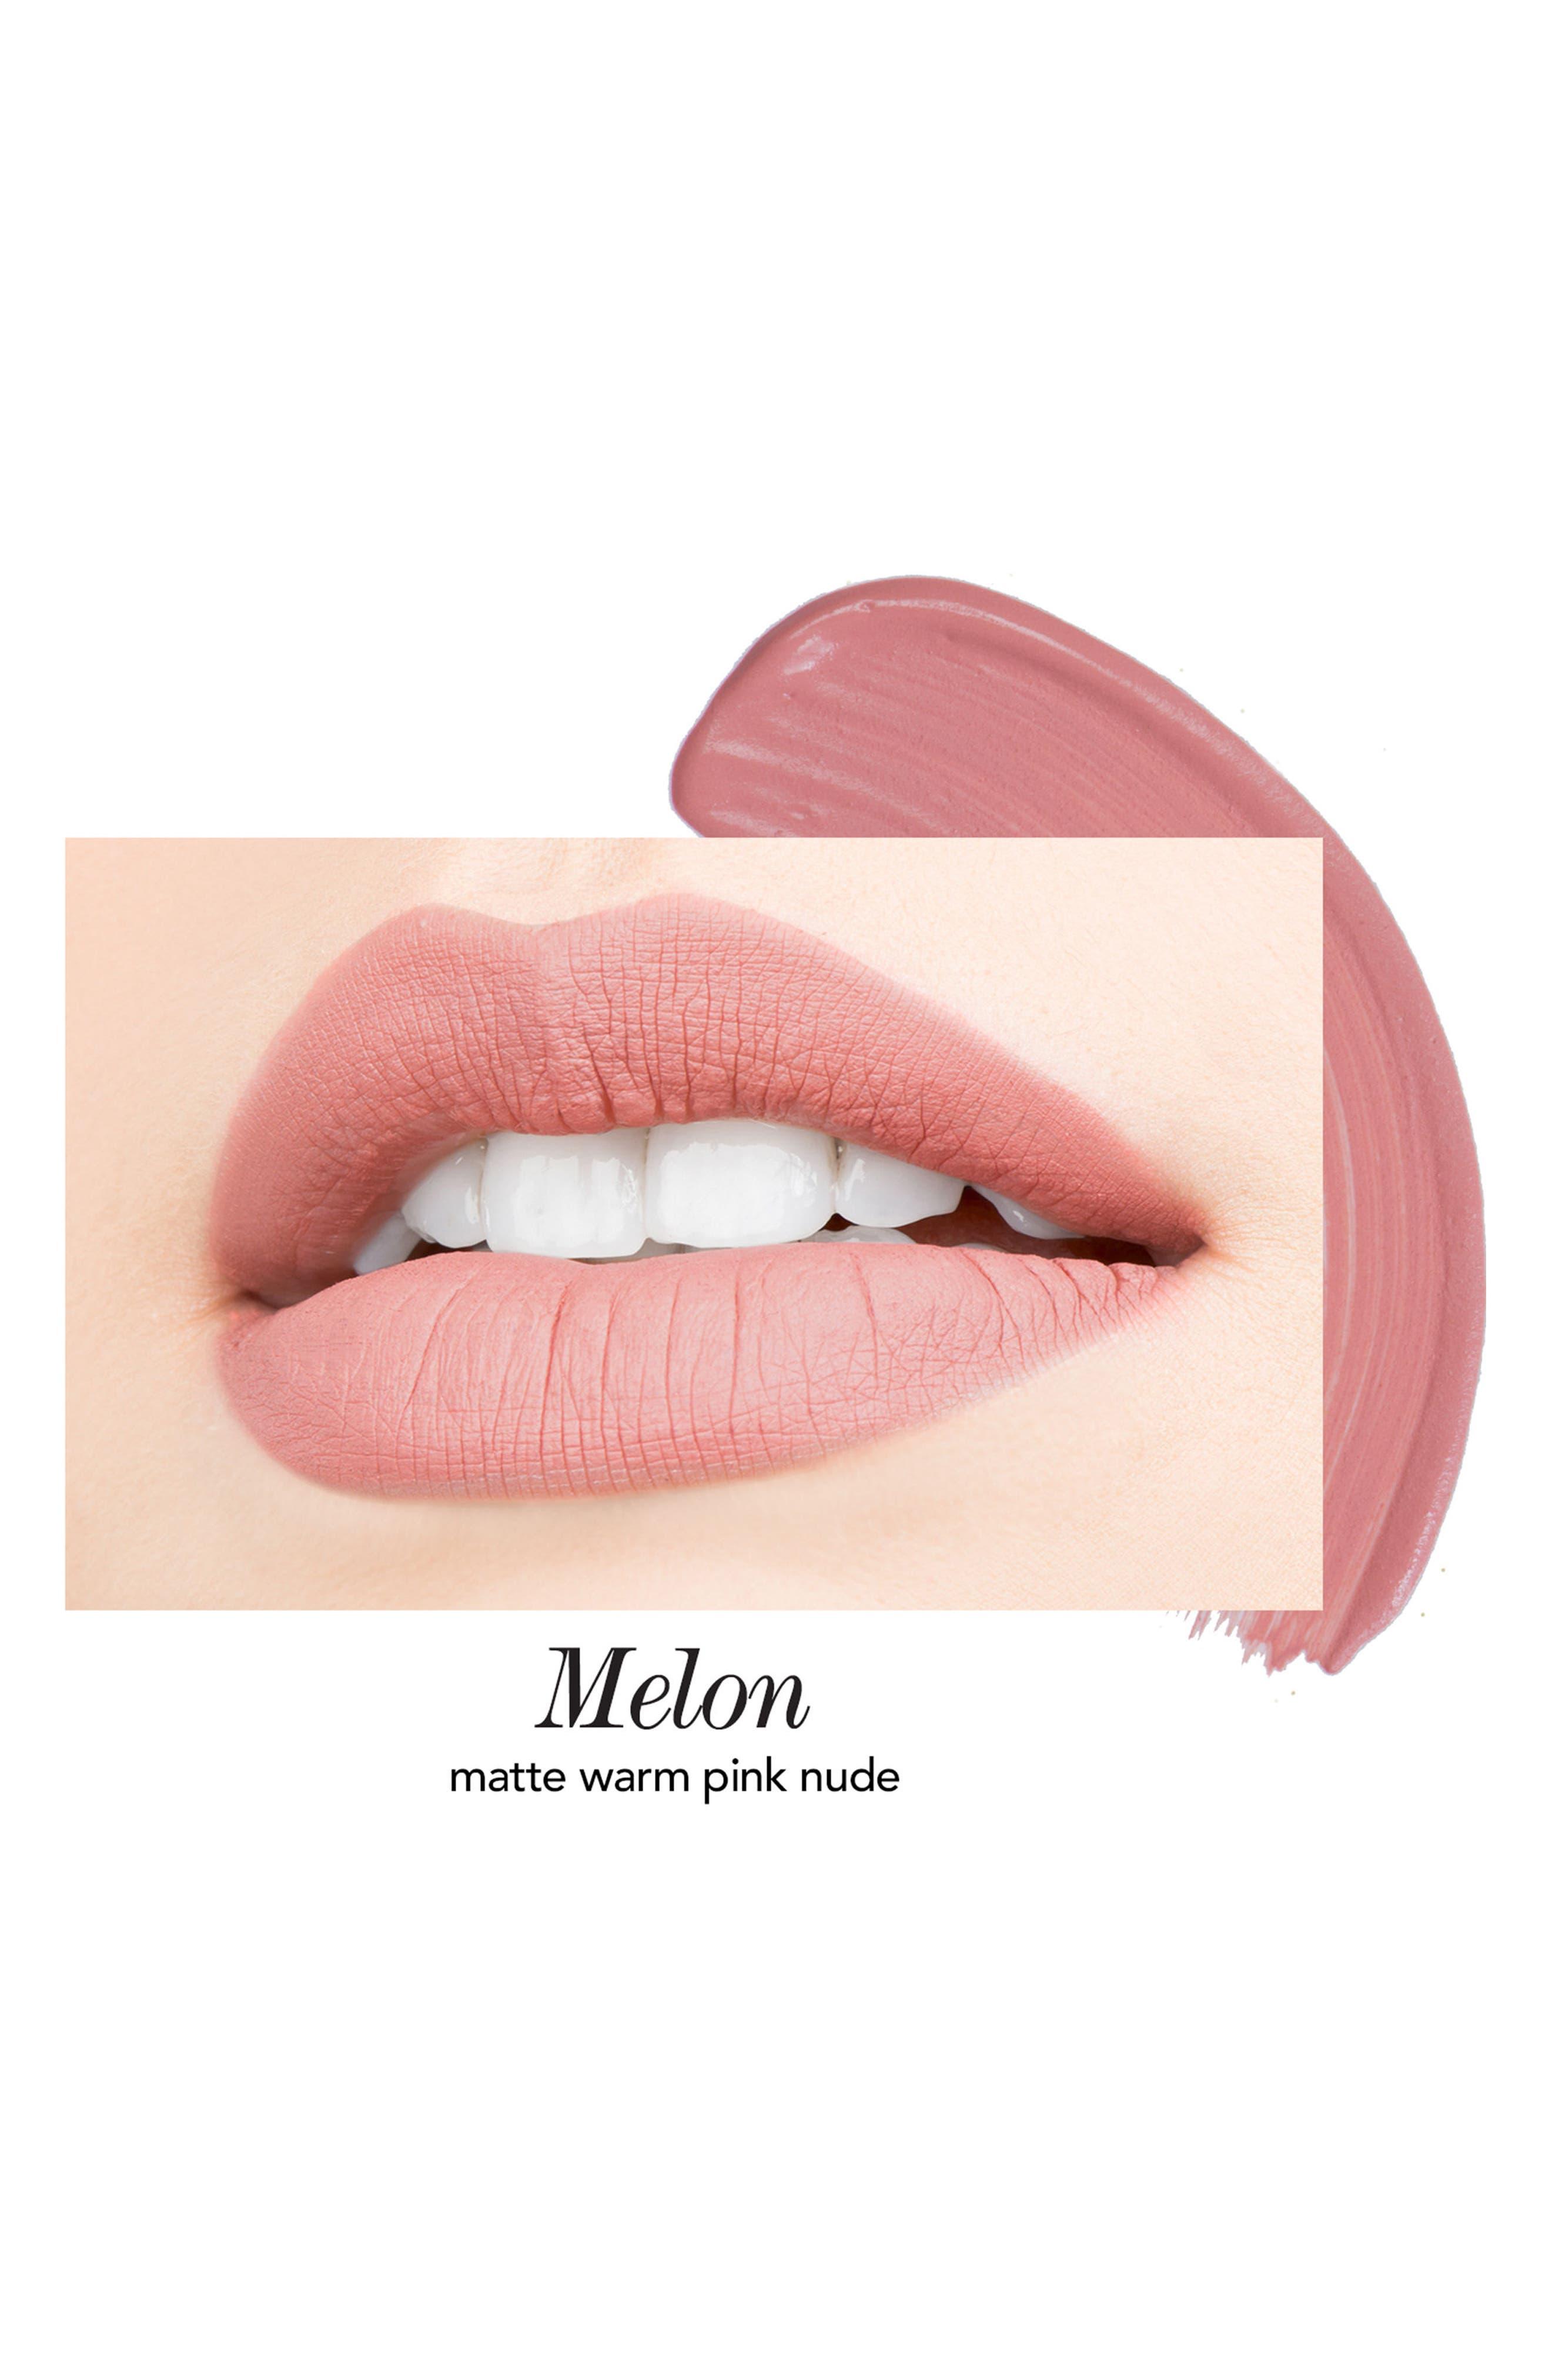 Melon & Citronade Rose Long-Wear Lip Crème Liquid Lipstick Duo,                             Alternate thumbnail 4, color,